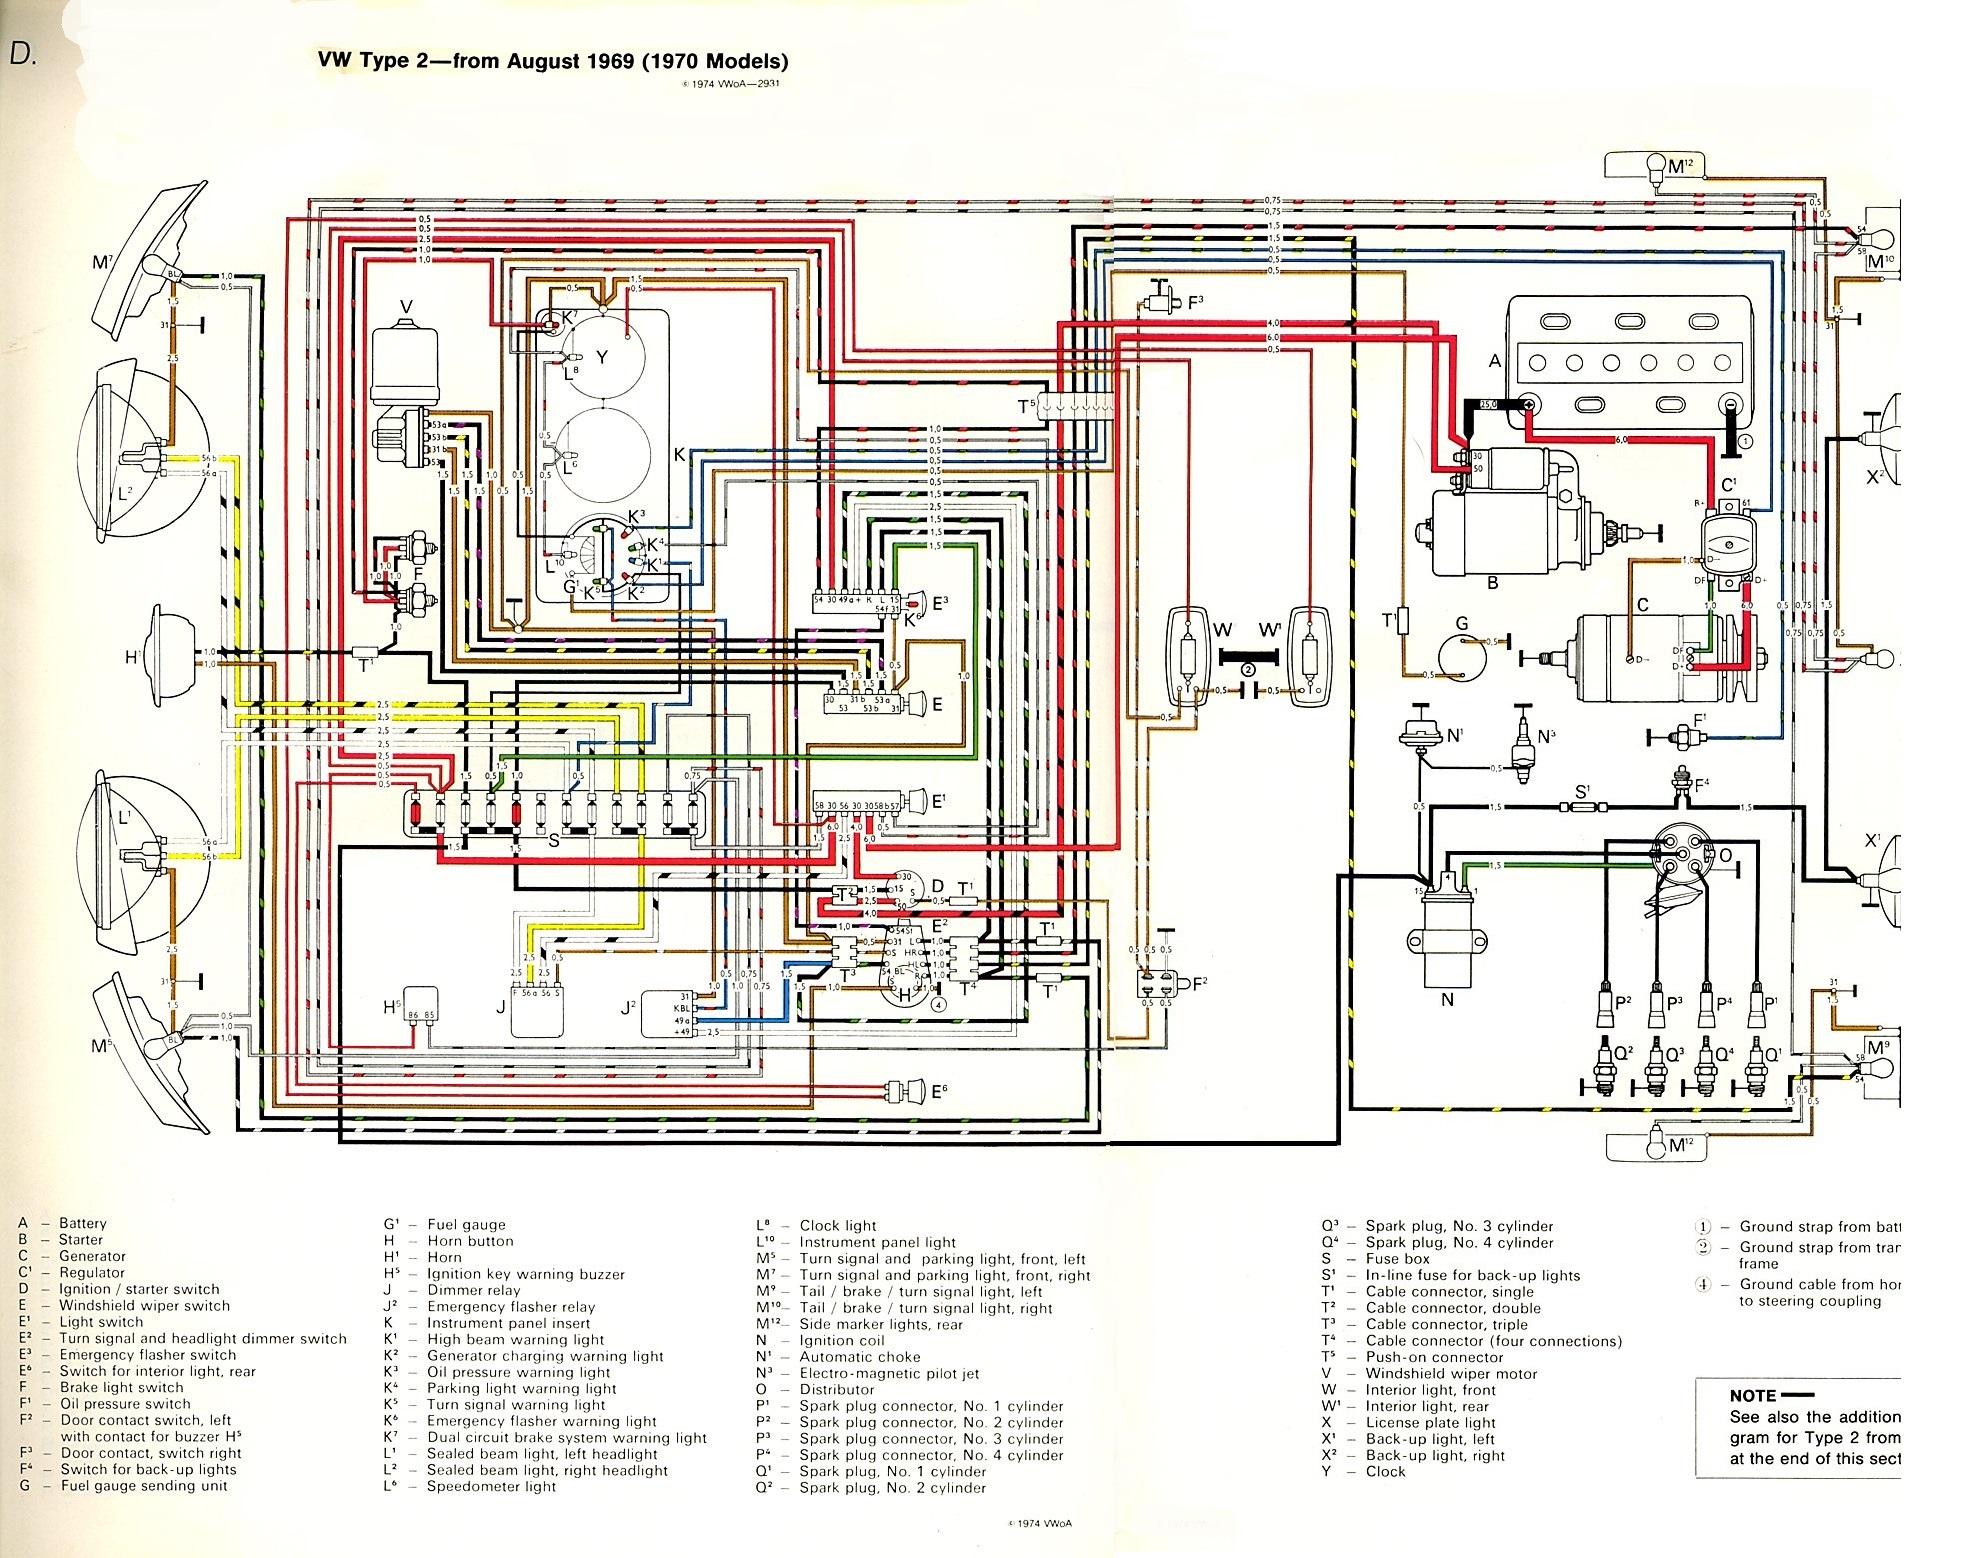 77 vw van wiring diagram free download 12 16 tridonicsignage de \u2022 thesamba com type 2 wiring diagrams rh thesamba com vw headlight switch wiring diagram vw engine